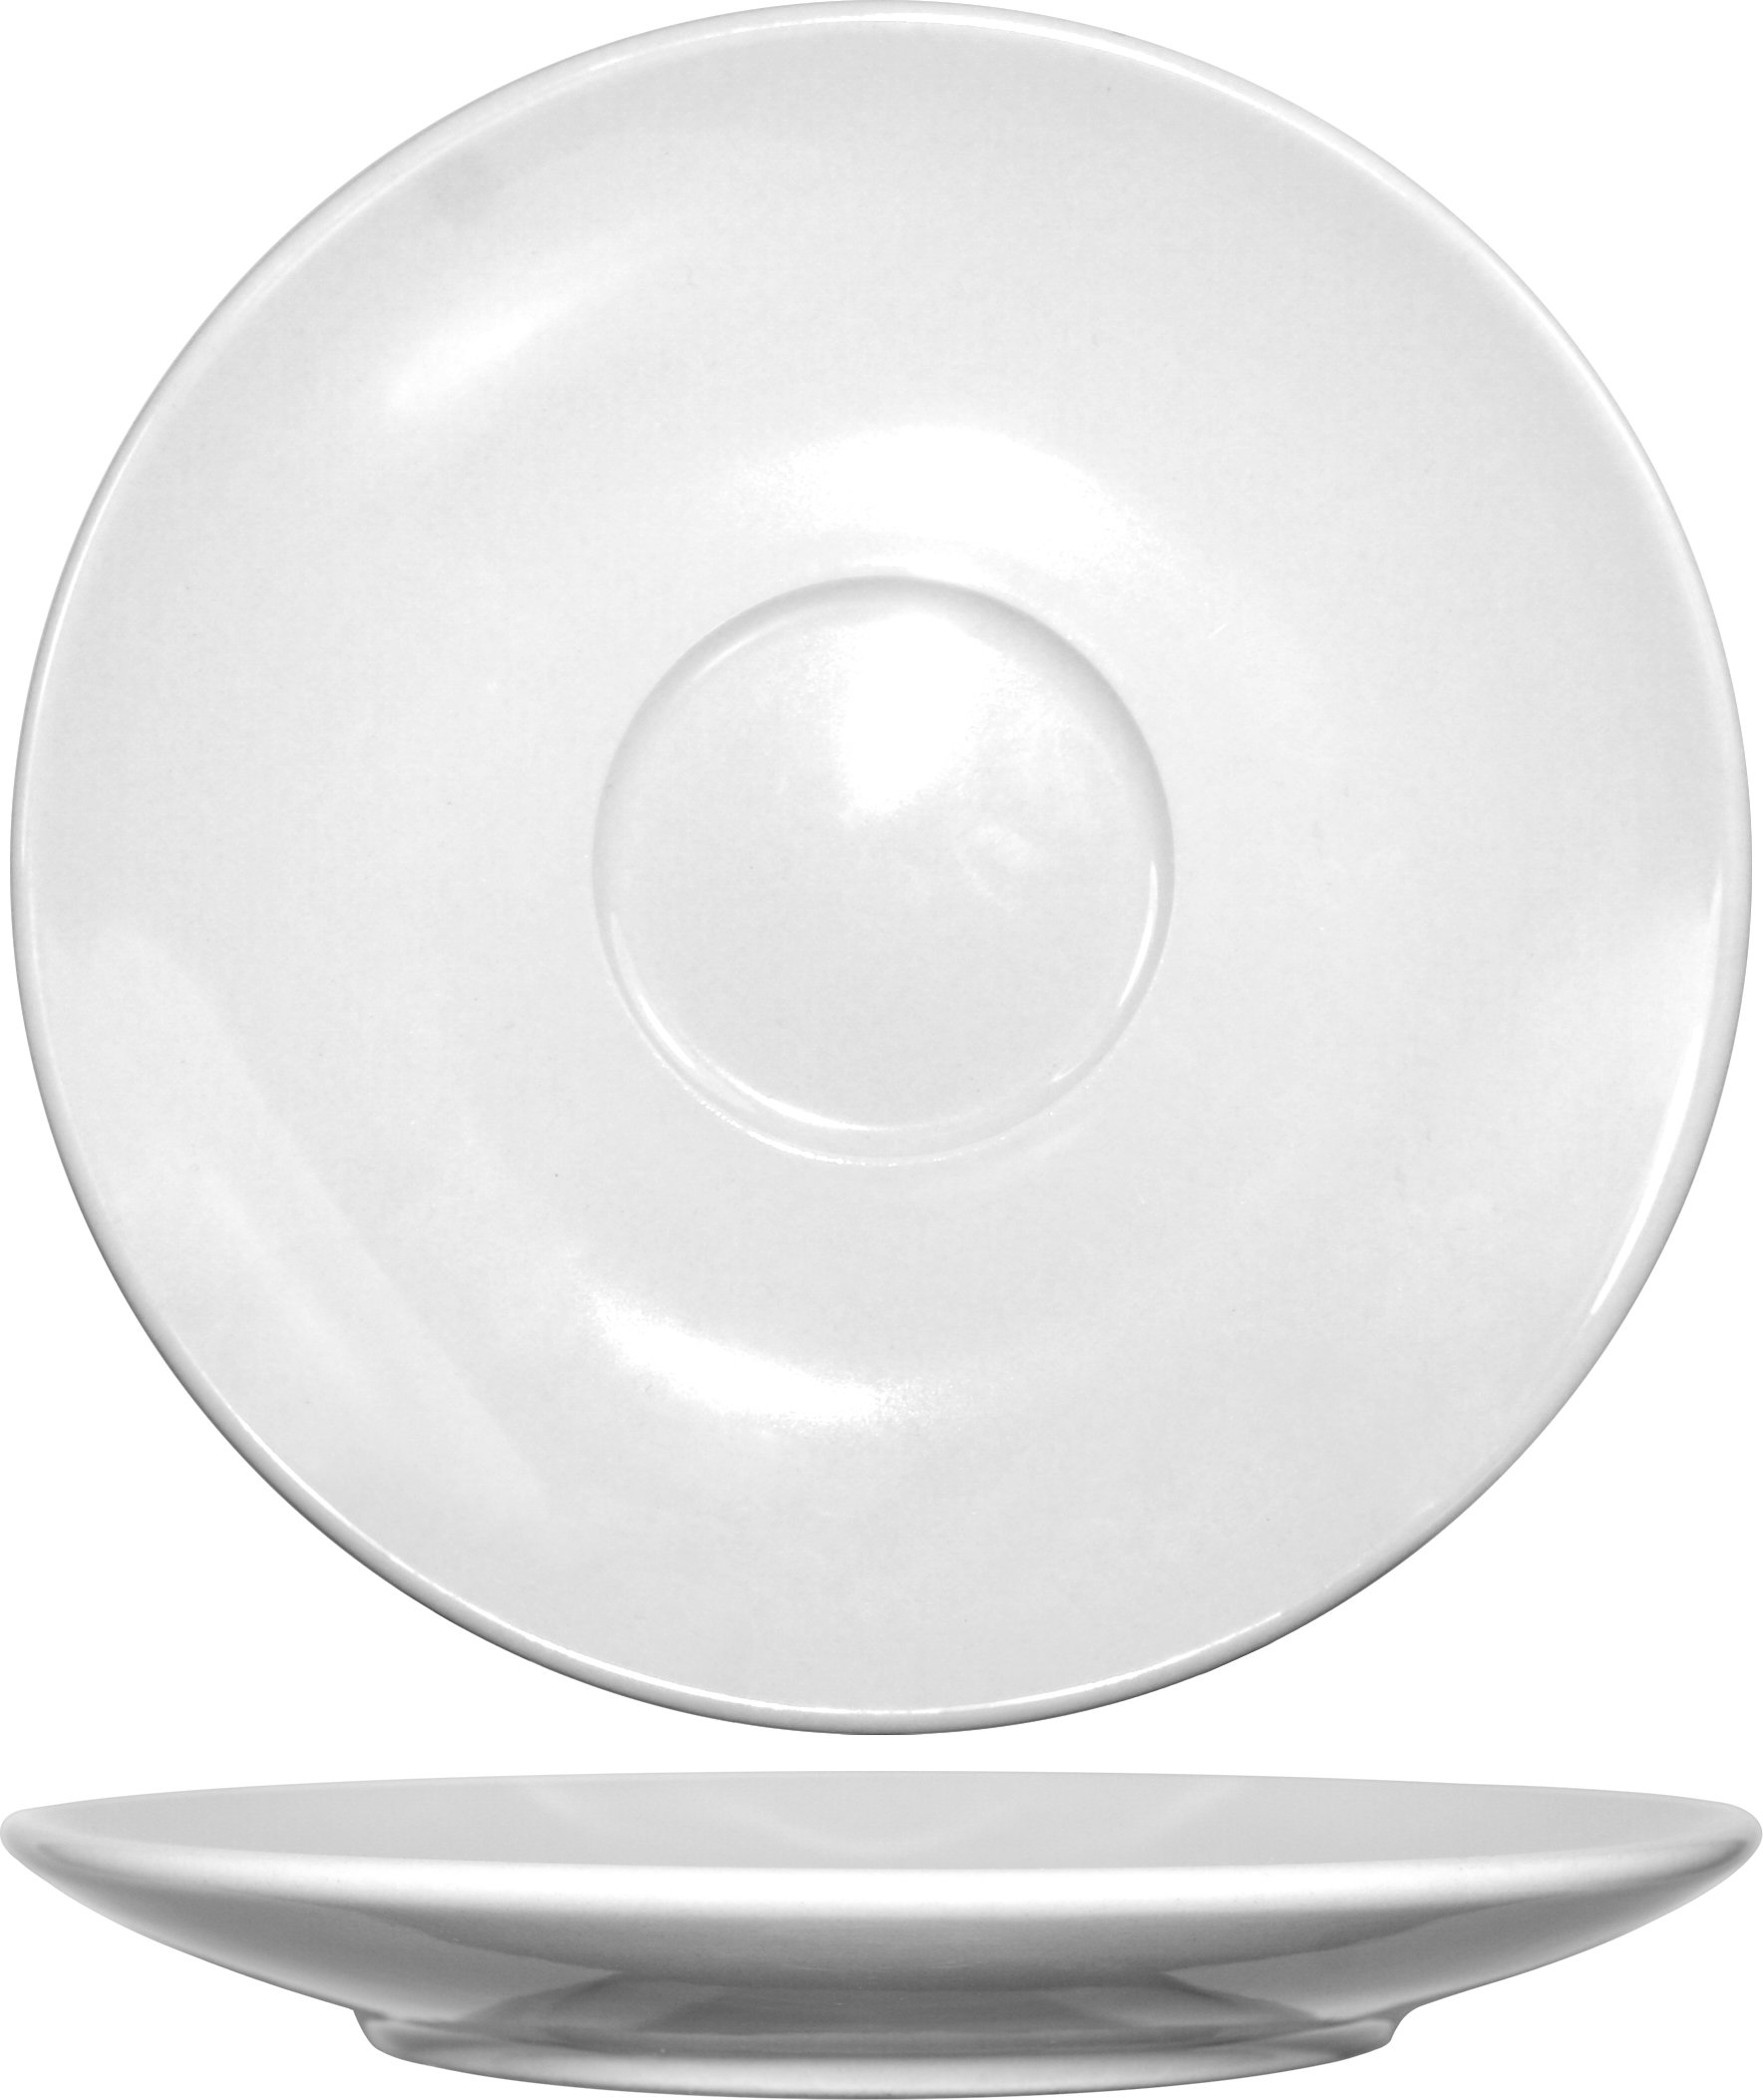 ITI DO-66 36-Piece Porcelain Dover Saucer for Cappuccino Cup, 8-Ounce, White